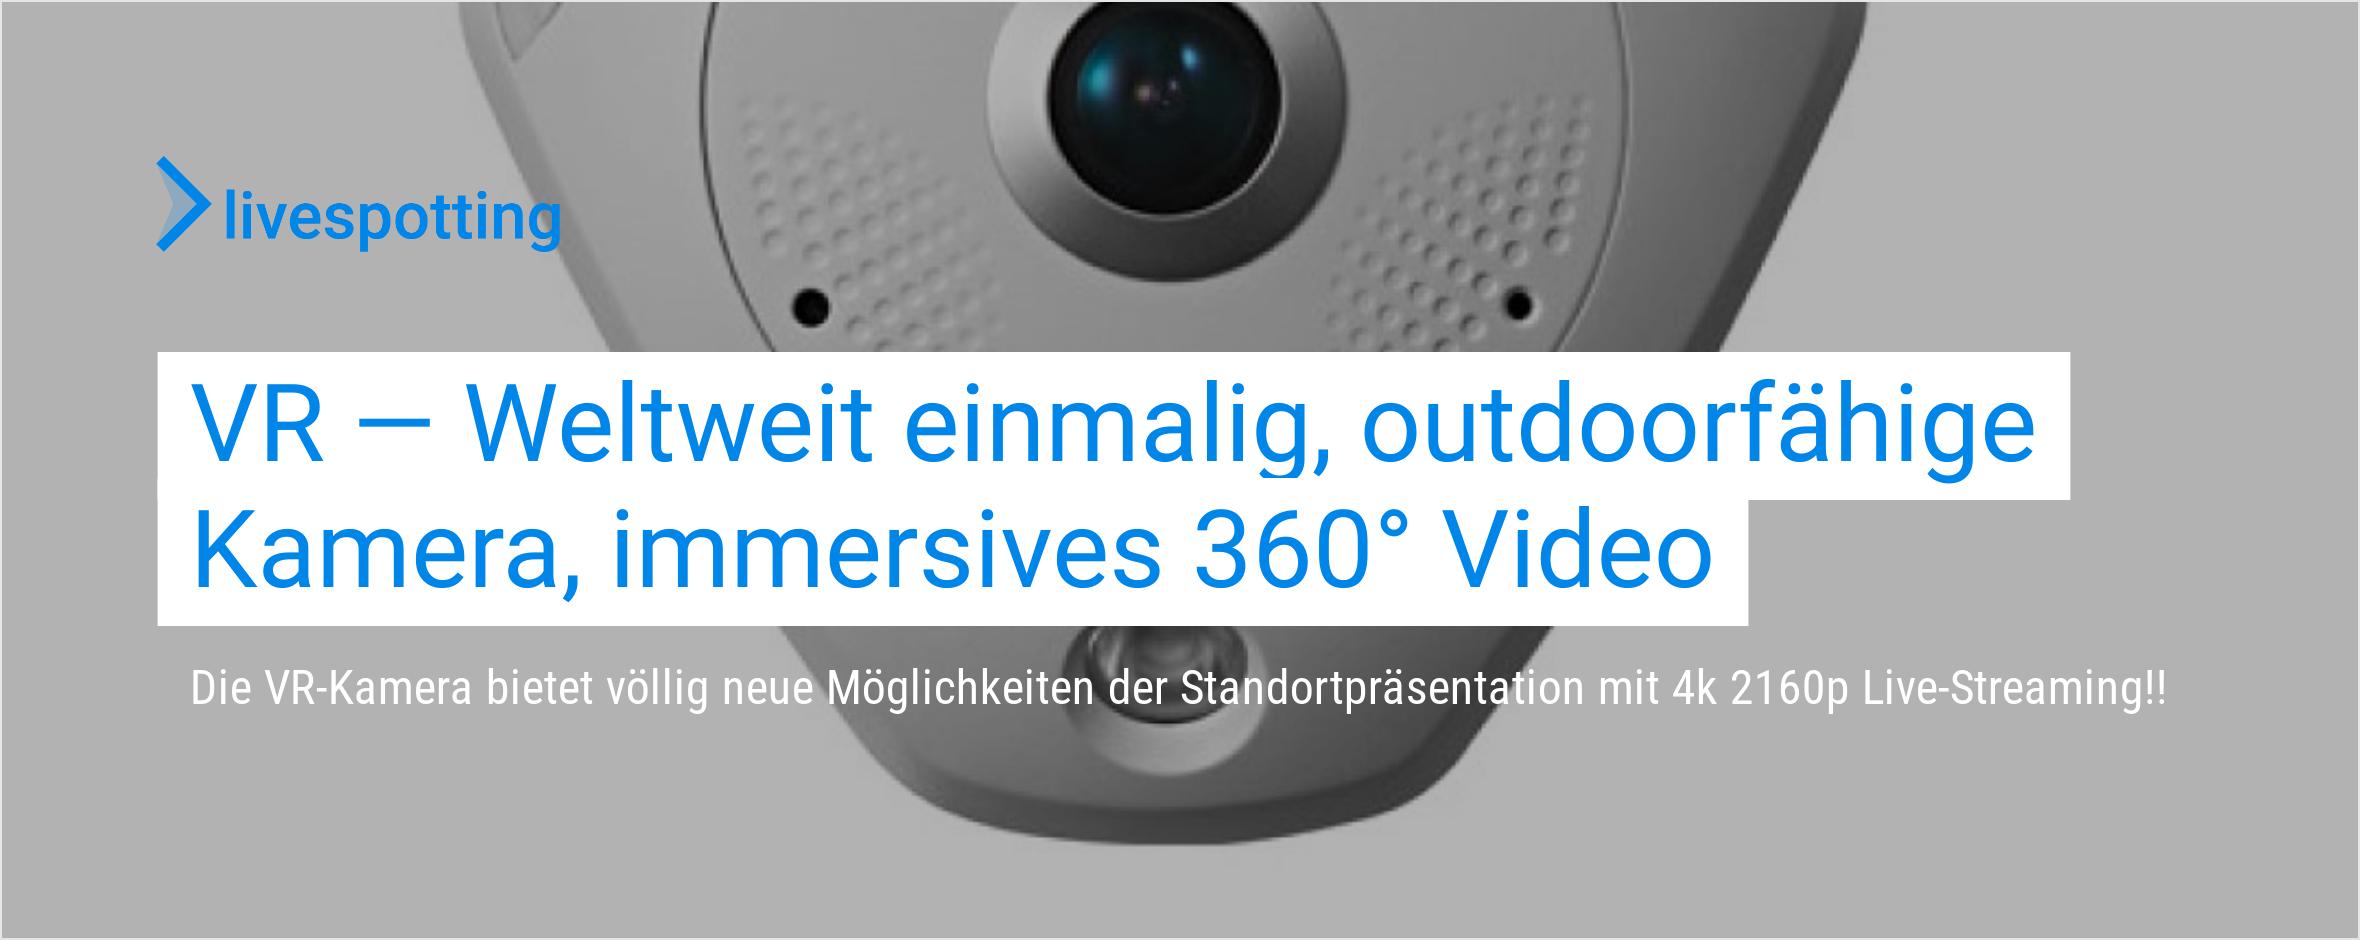 Virtual Reality Livestreaming für Events mit Fisheye Kameras.